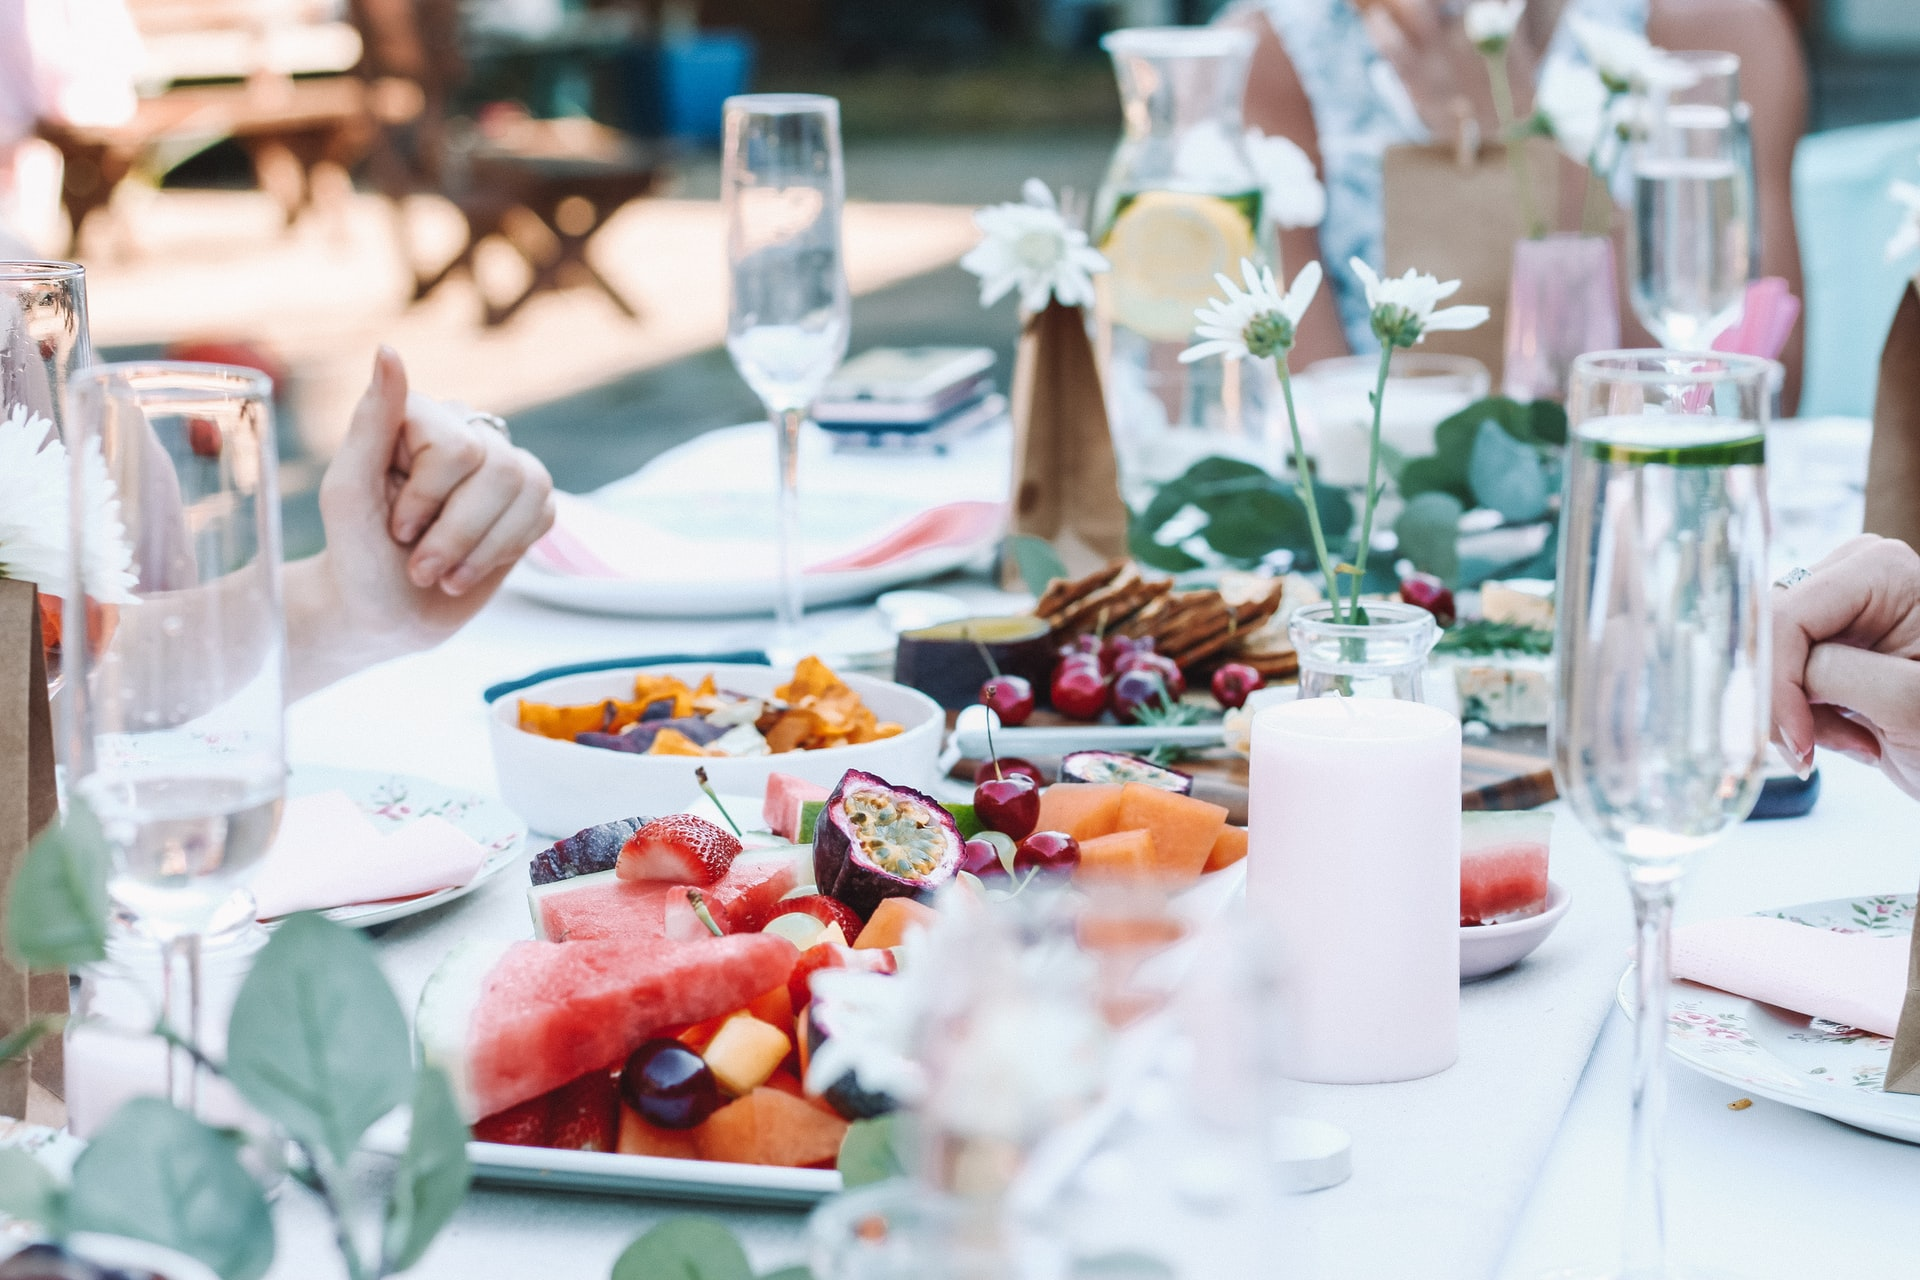 Best Outdoor Restaurants In South London